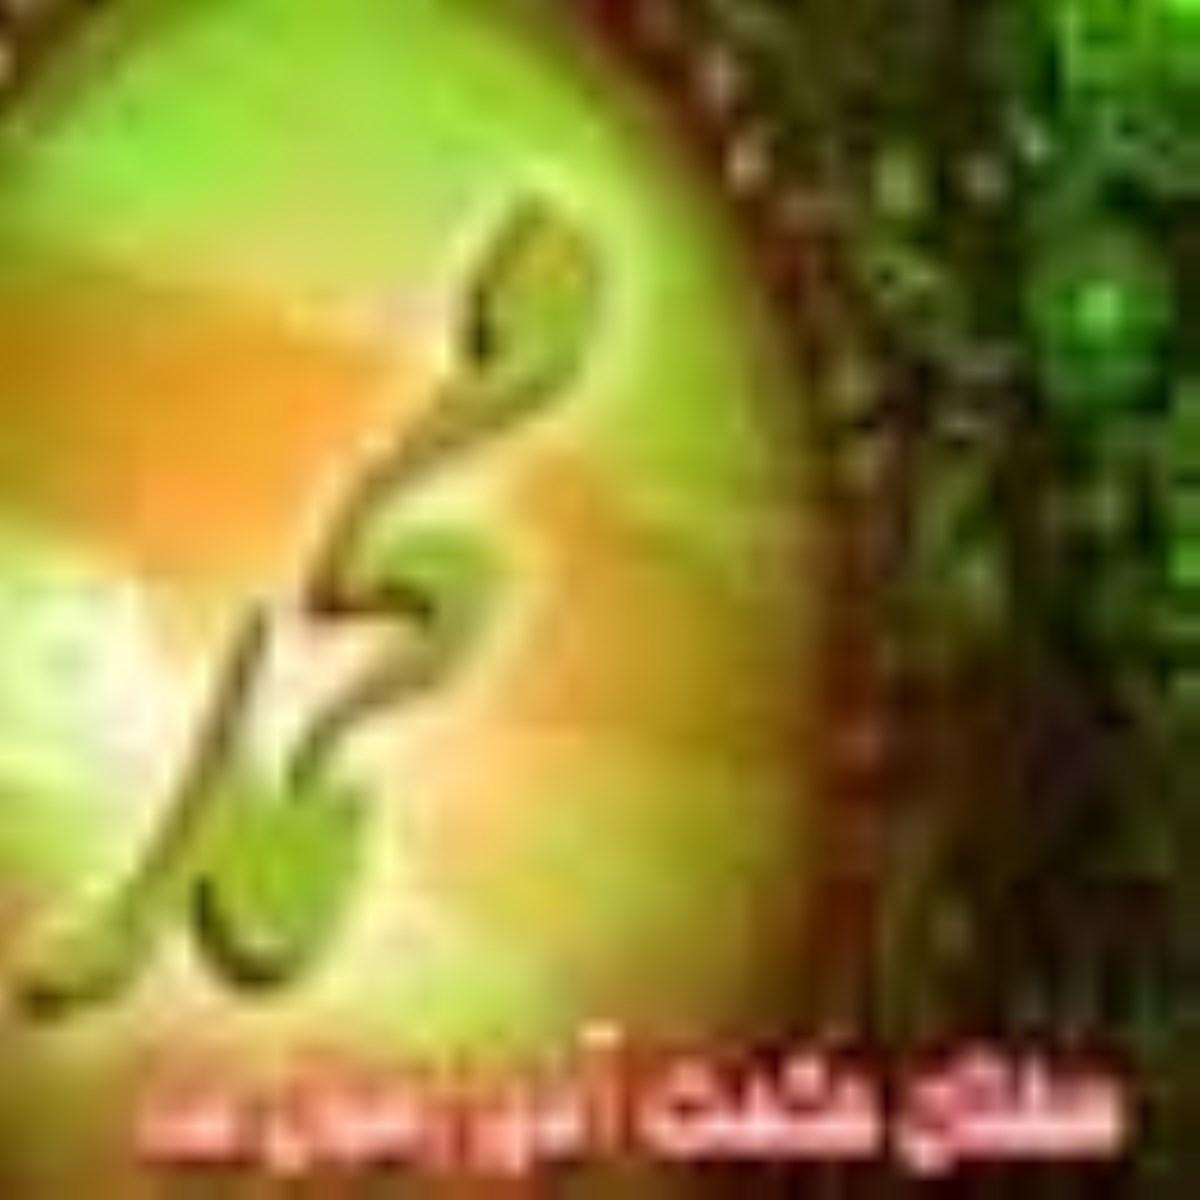 سخنان حكمت آميز رسول خدا( صلی الله علیه واله )